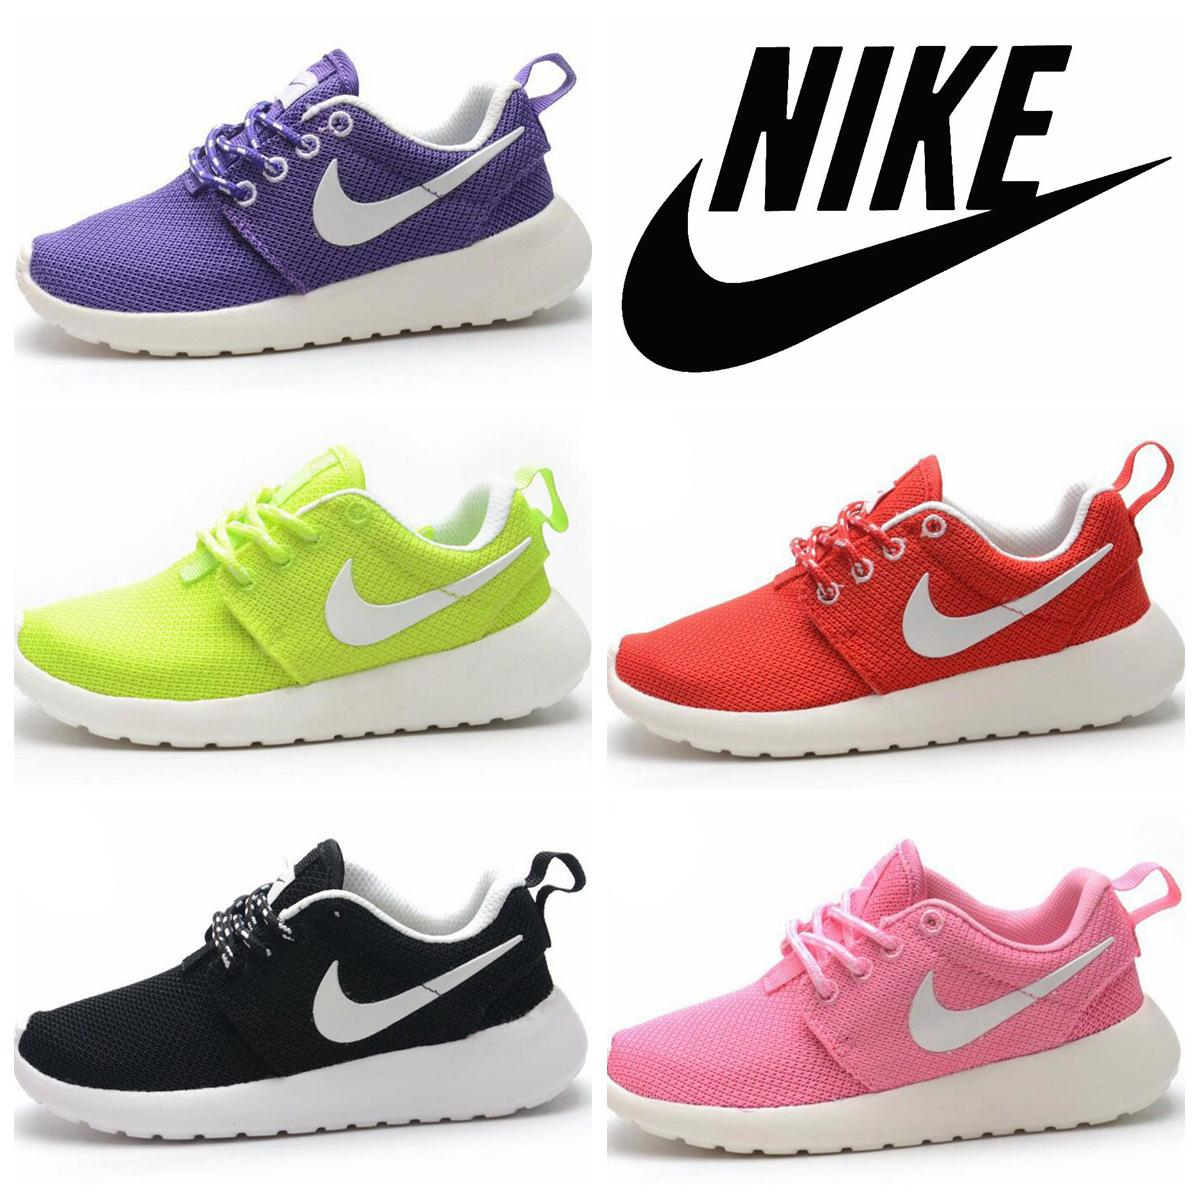 050fd8b254 Buy cheap   nike shoes for girls | cheap roshe run nike trainers sale